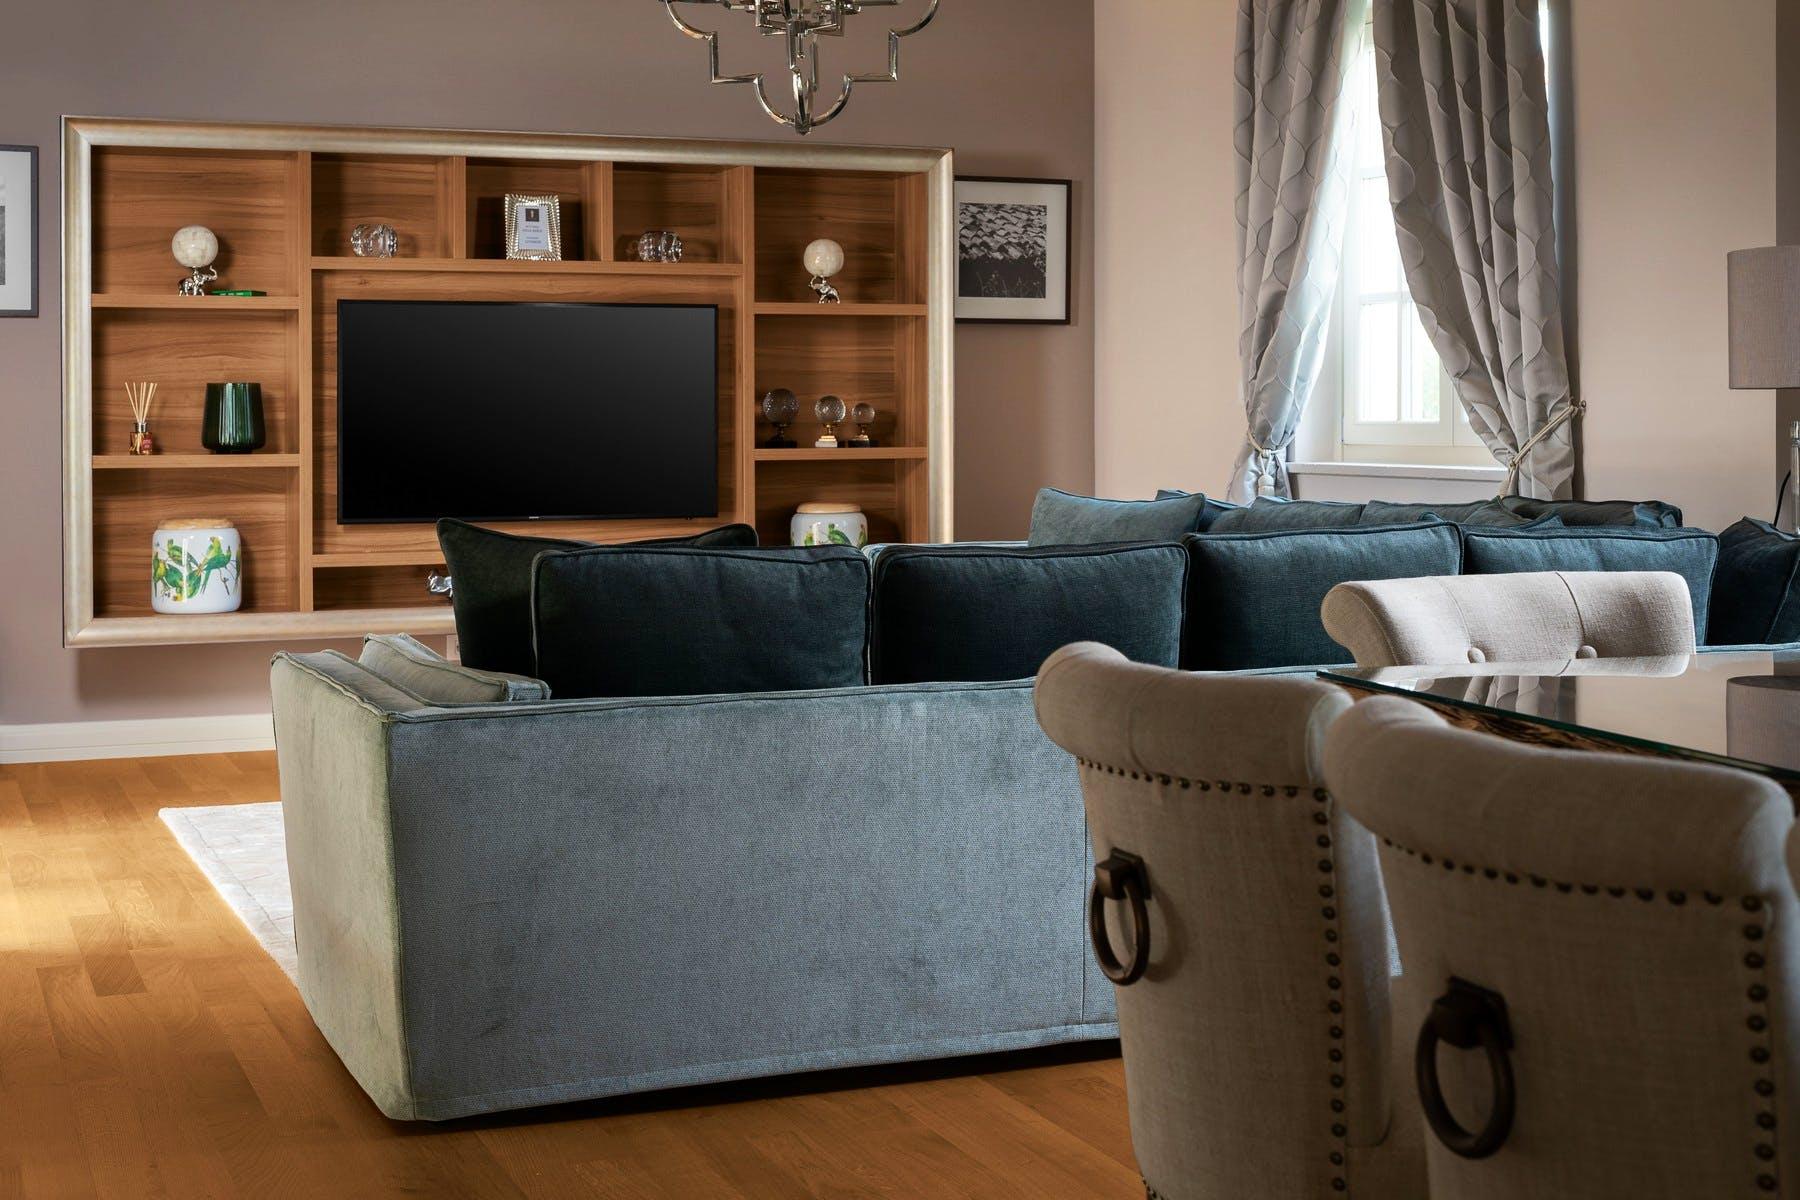 Living room area with lavish decor details